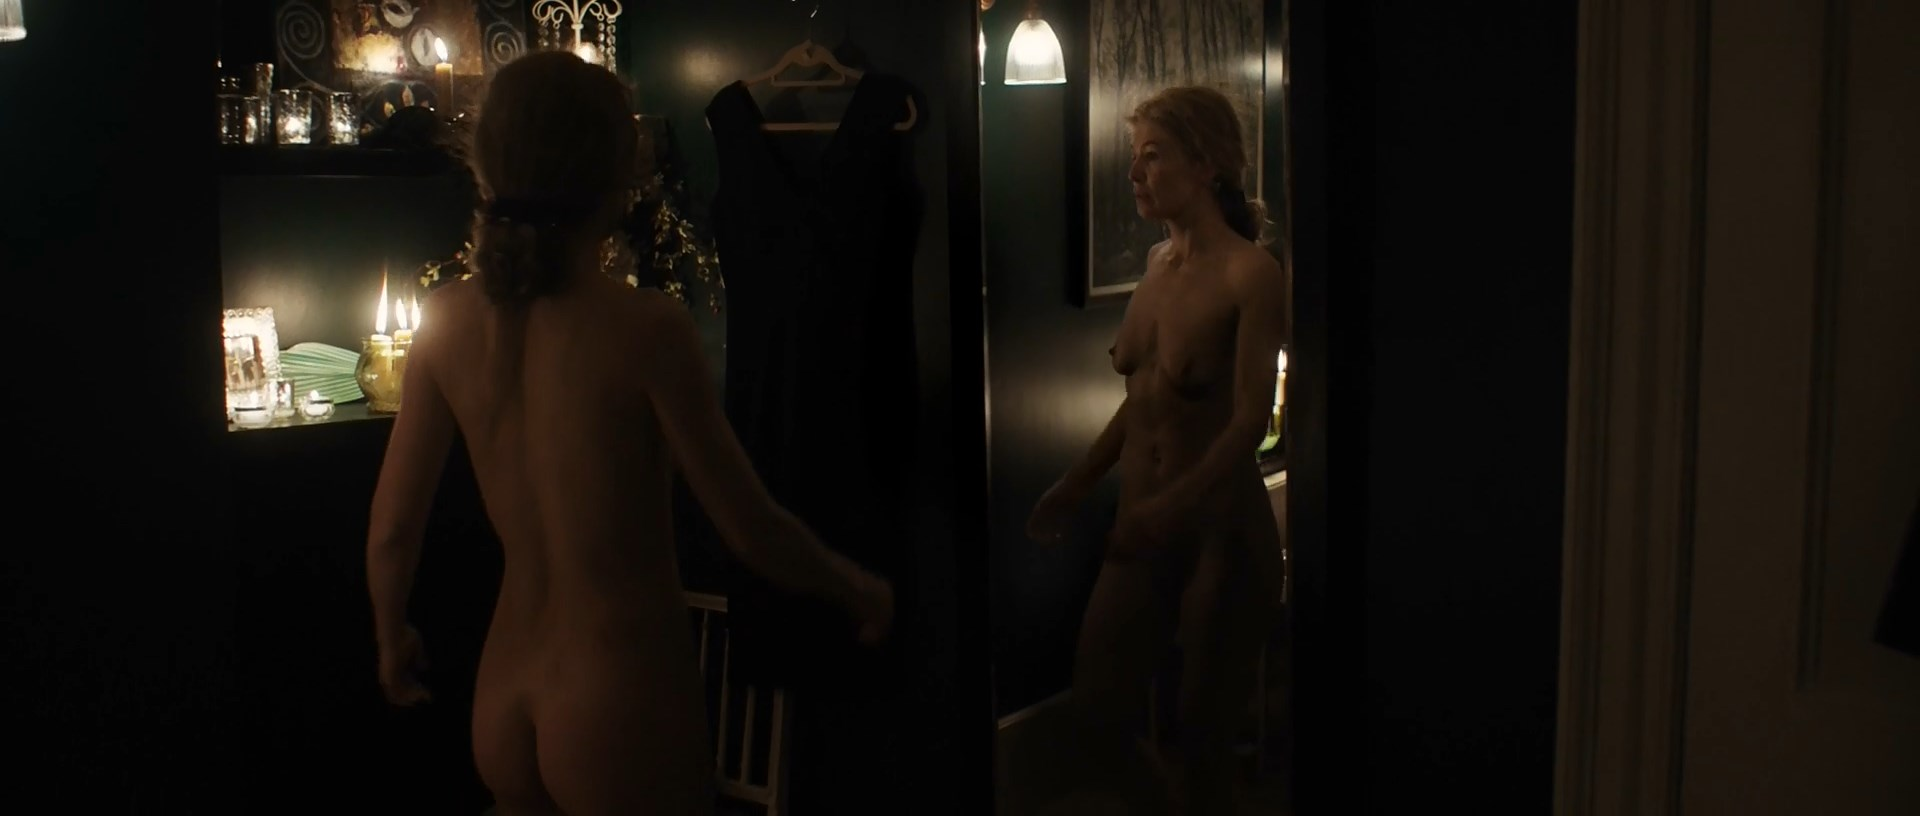 Naked rosamunde pike Rosamund Pike